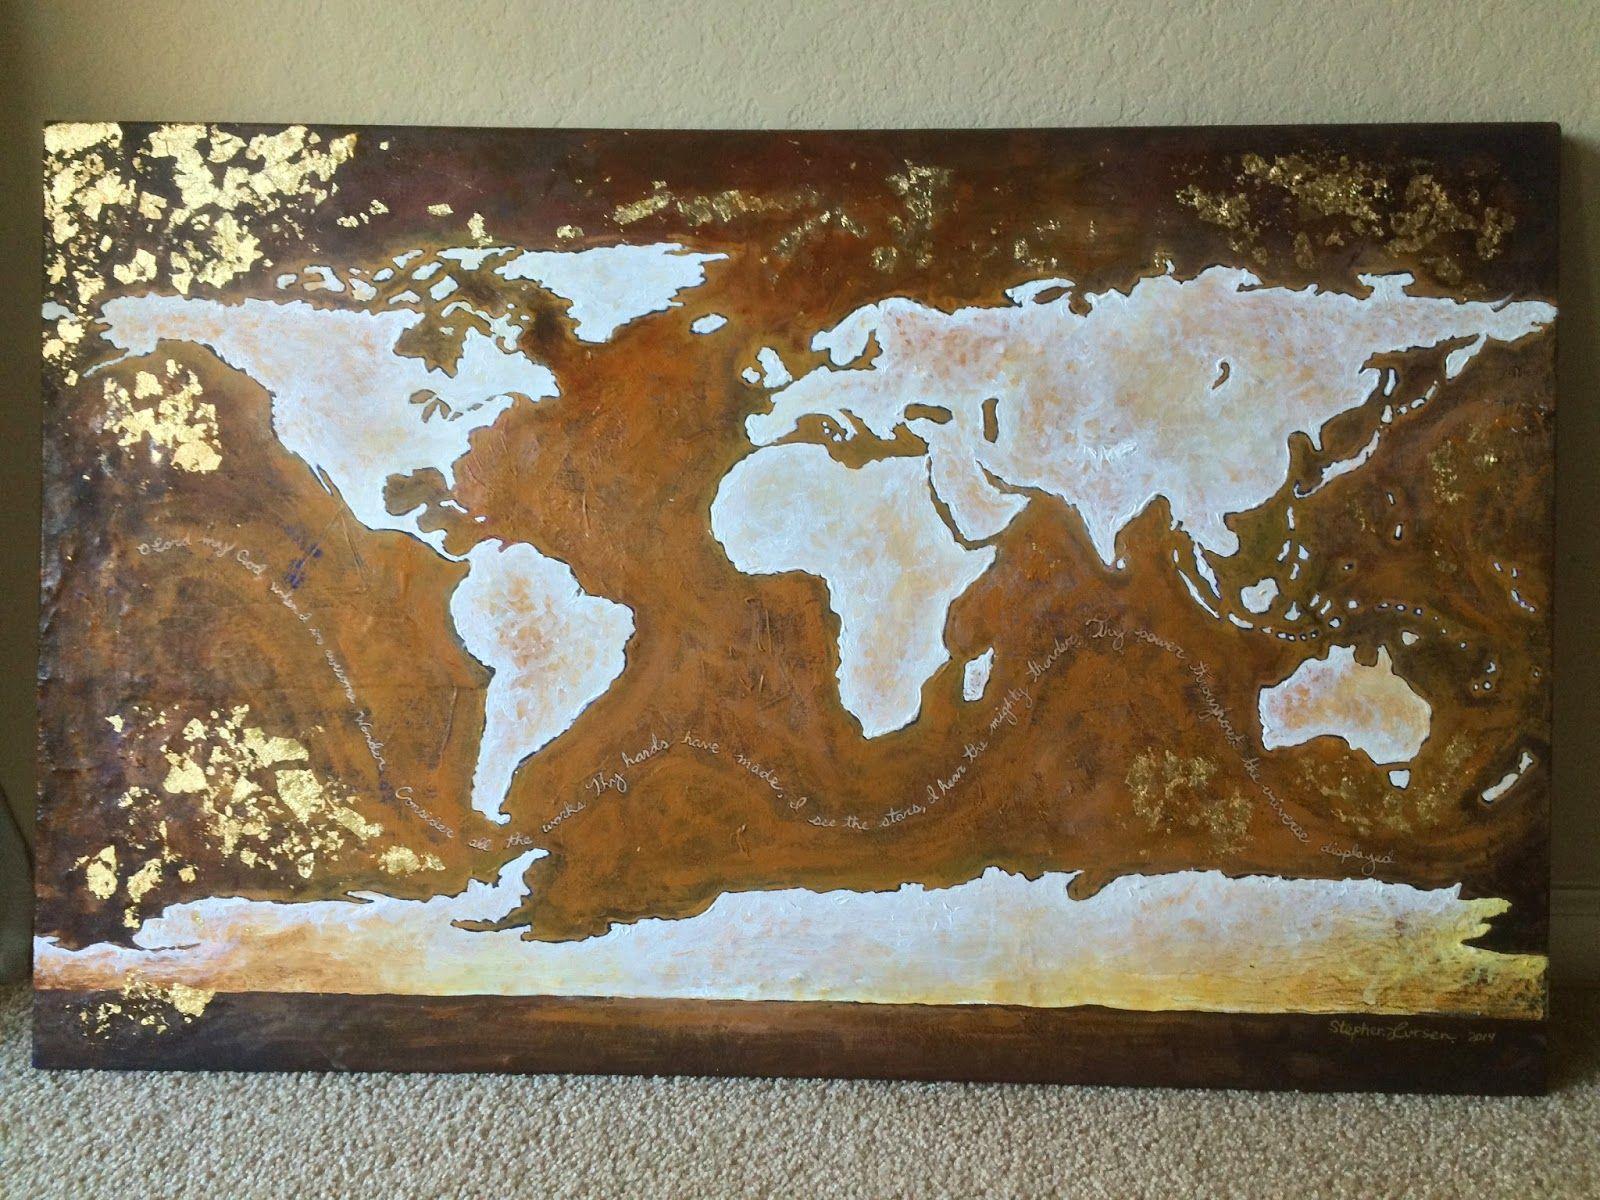 Stephen lursen art stephen lursen artist donna downeys x acrylic and gold leaf world map on canvas gumiabroncs Images